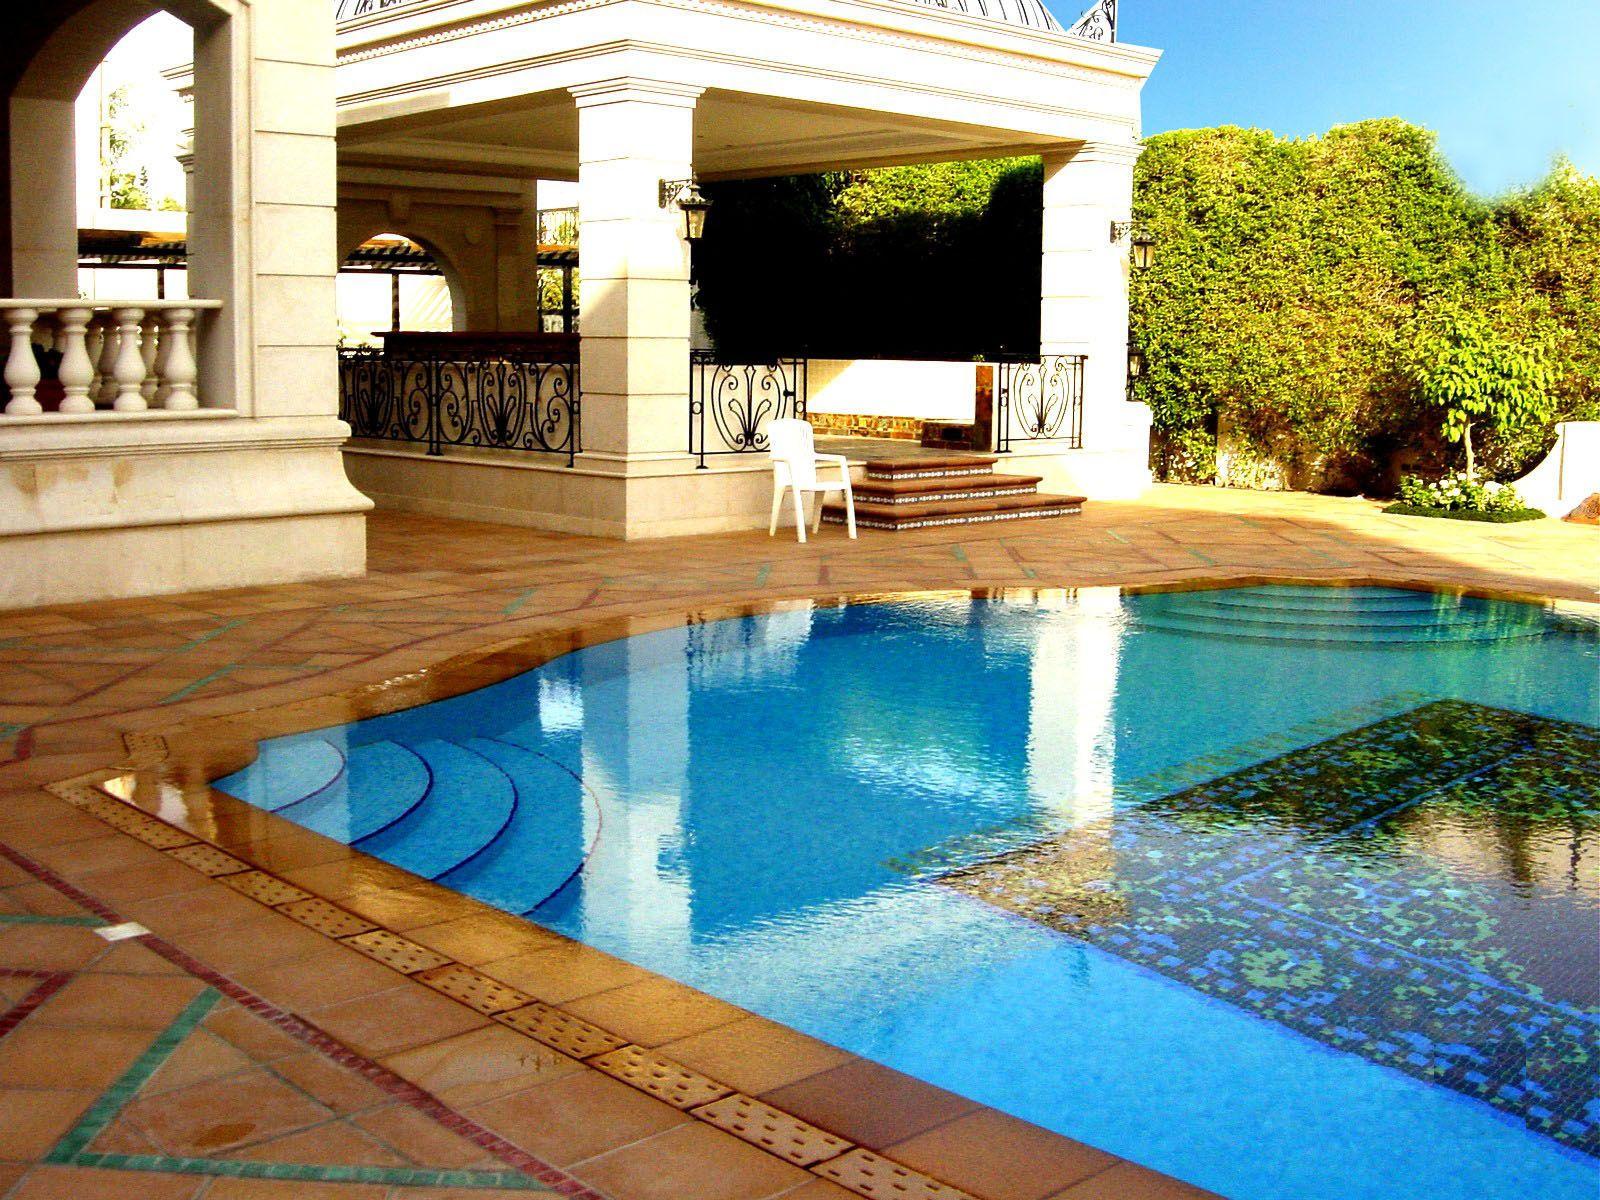 Cer mica para piscinas este material adem s de la - Material de piscina ...